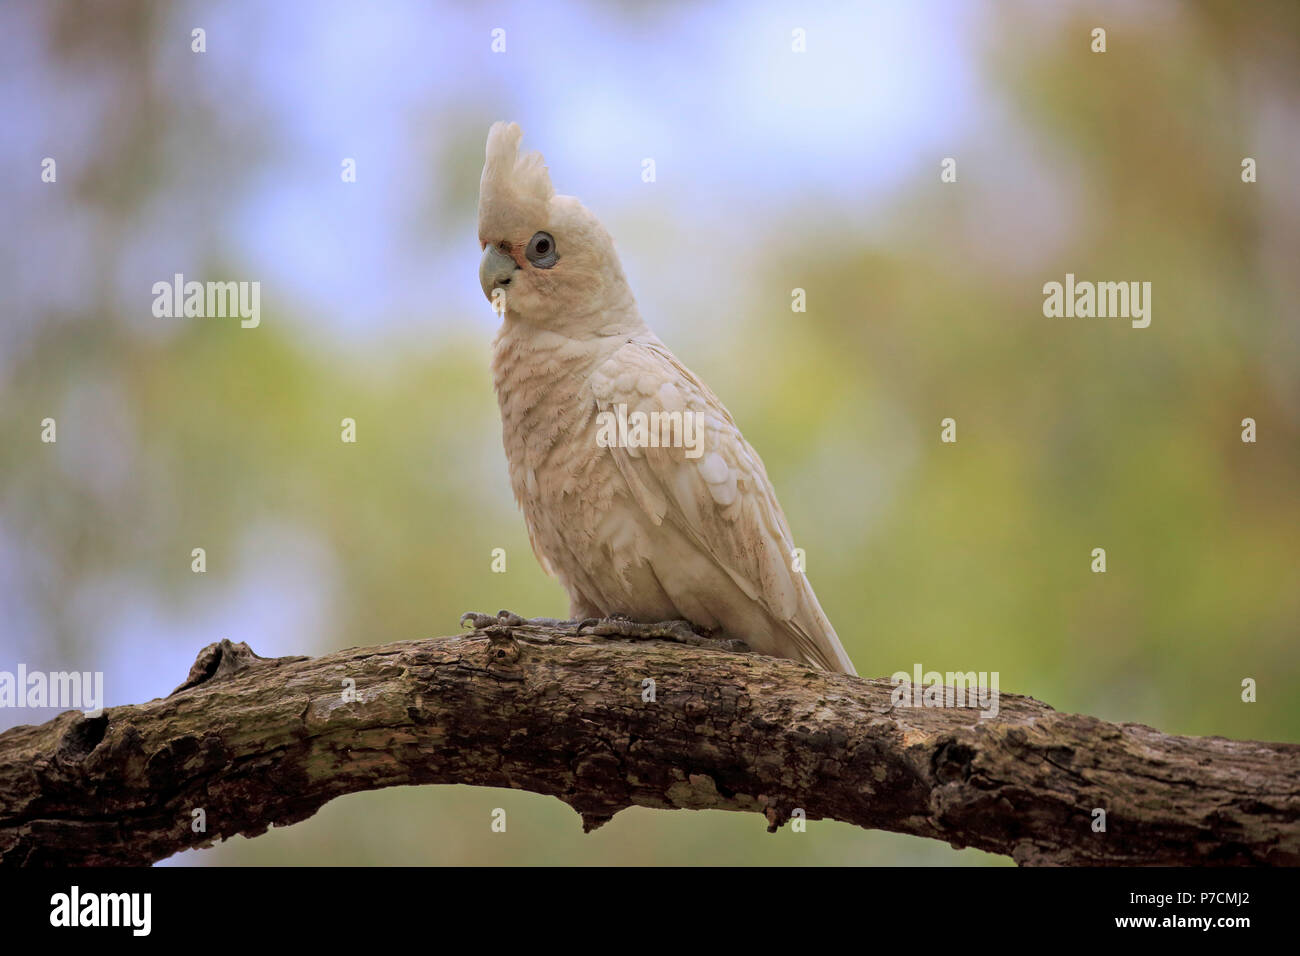 Little Corella, bare-eyed cockatoo, blood-stained cockatoo, short-billed corella, little cockatoo, blue-eyed cockatoo, adult on tree, Sturt Nationalpark, New South Wales, Australia, (Cacatua sanguinea) - Stock Image